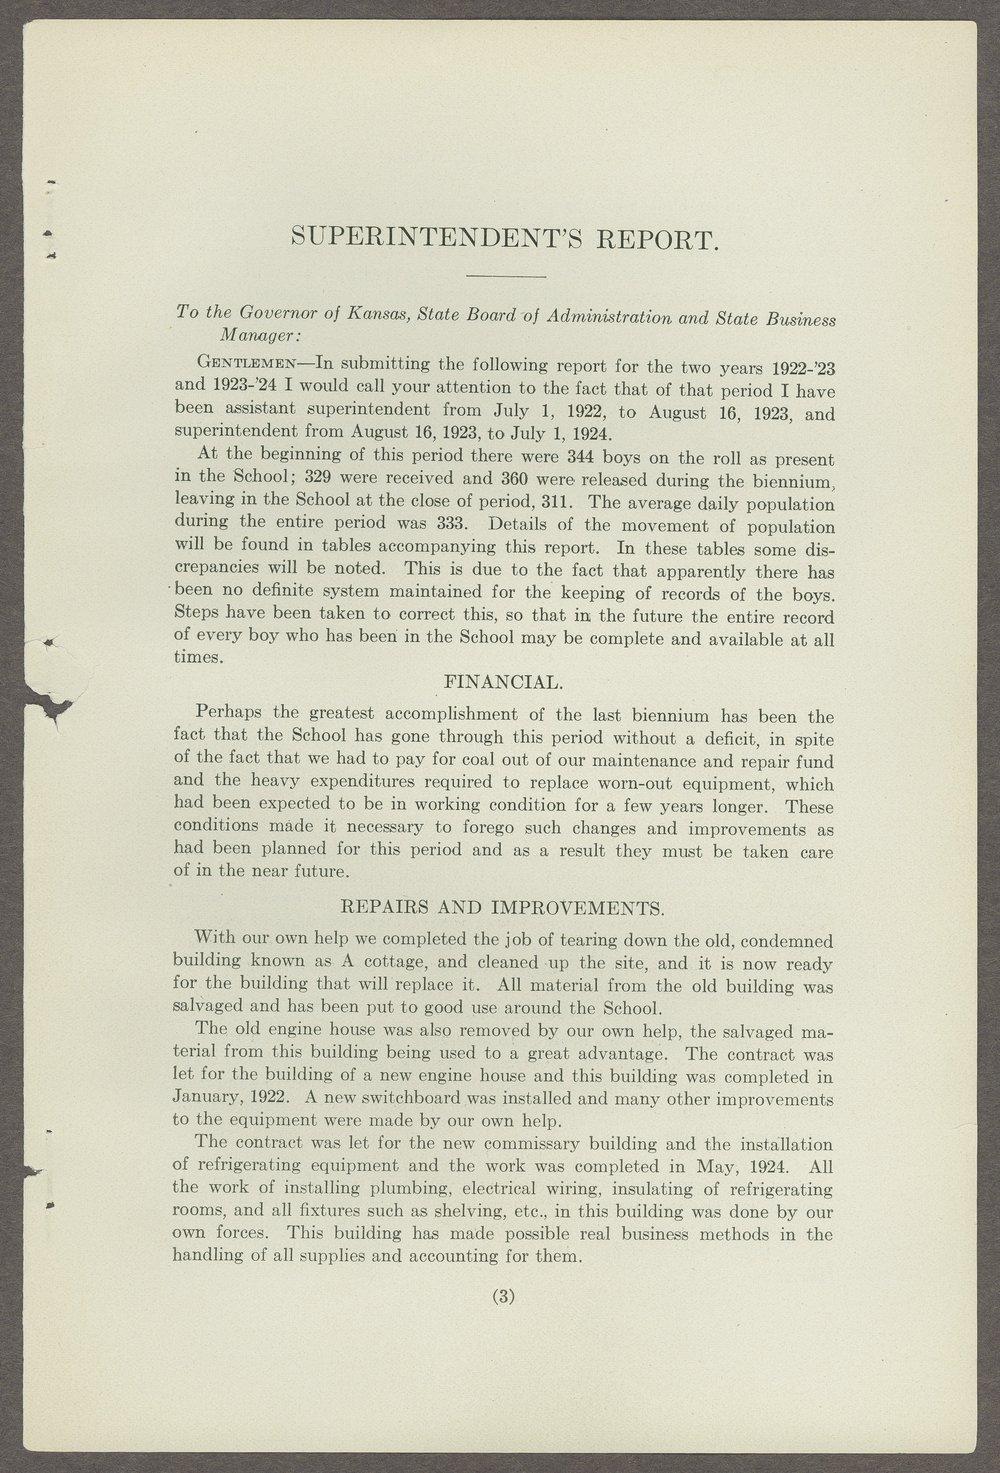 Biennial report of the Boys Industrial School, 1924 - 3